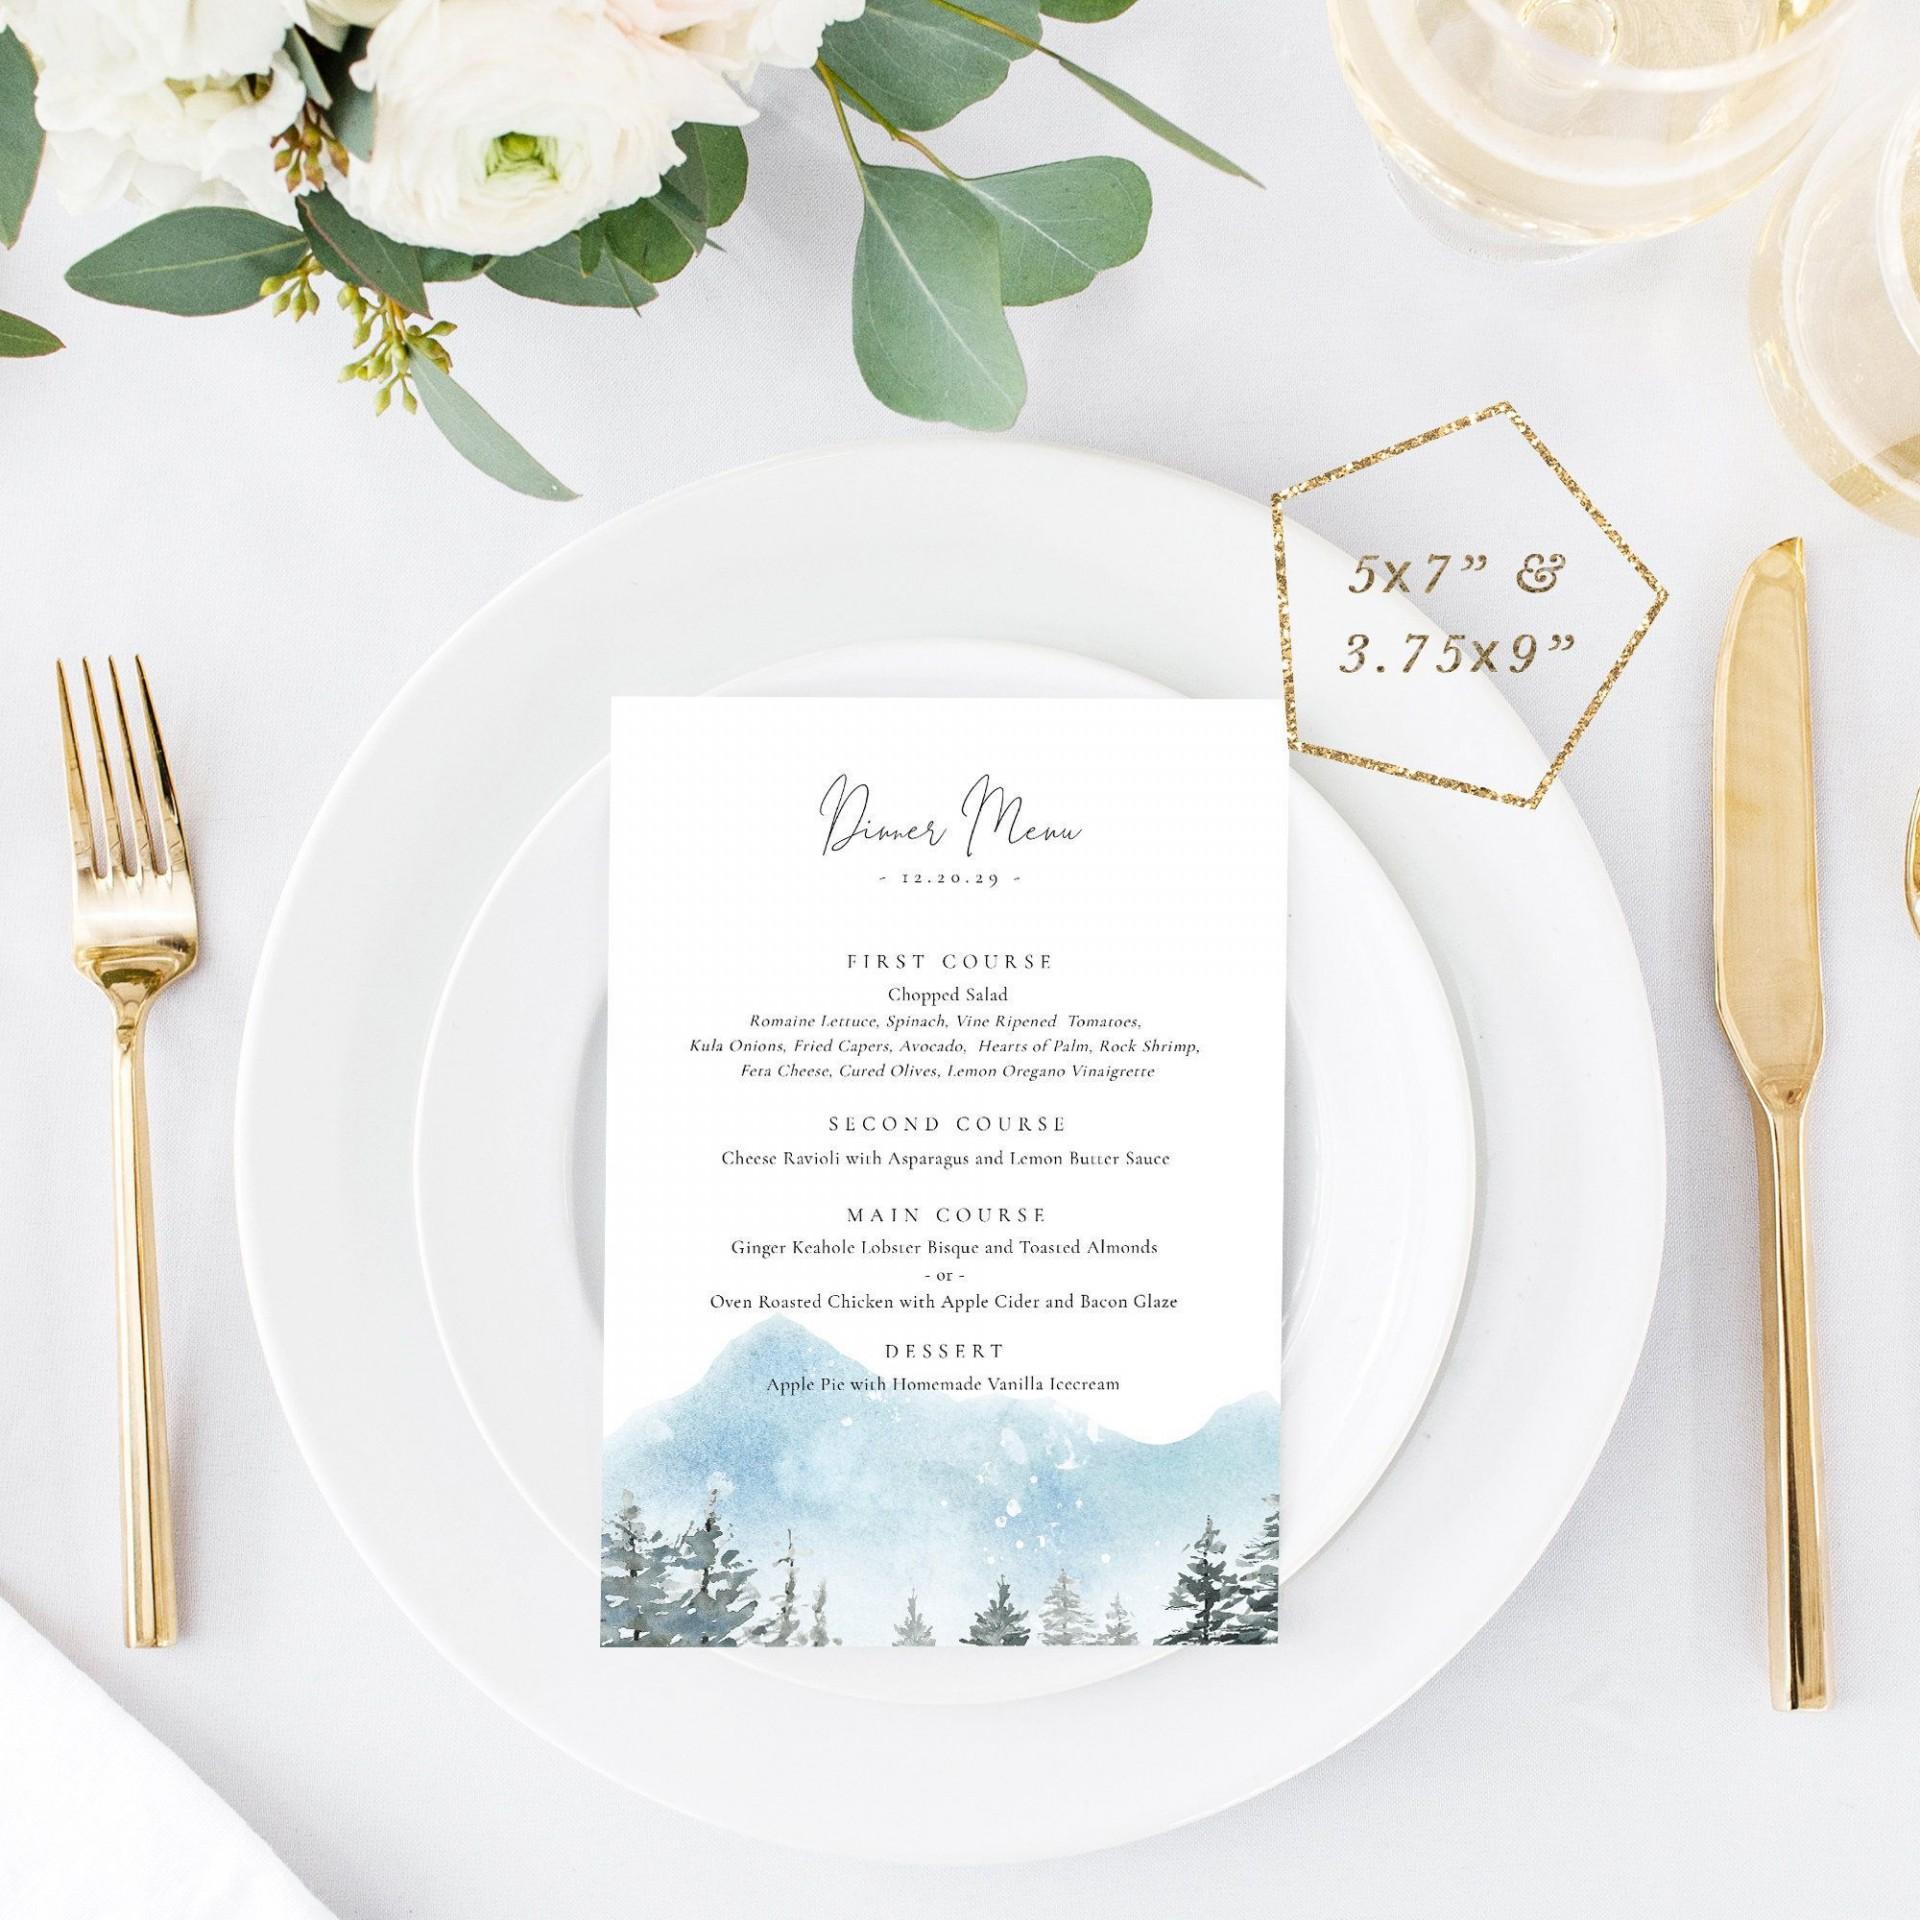 001 Excellent Dinner Party Menu Template Sample  Word Elegant Free Google Doc1920